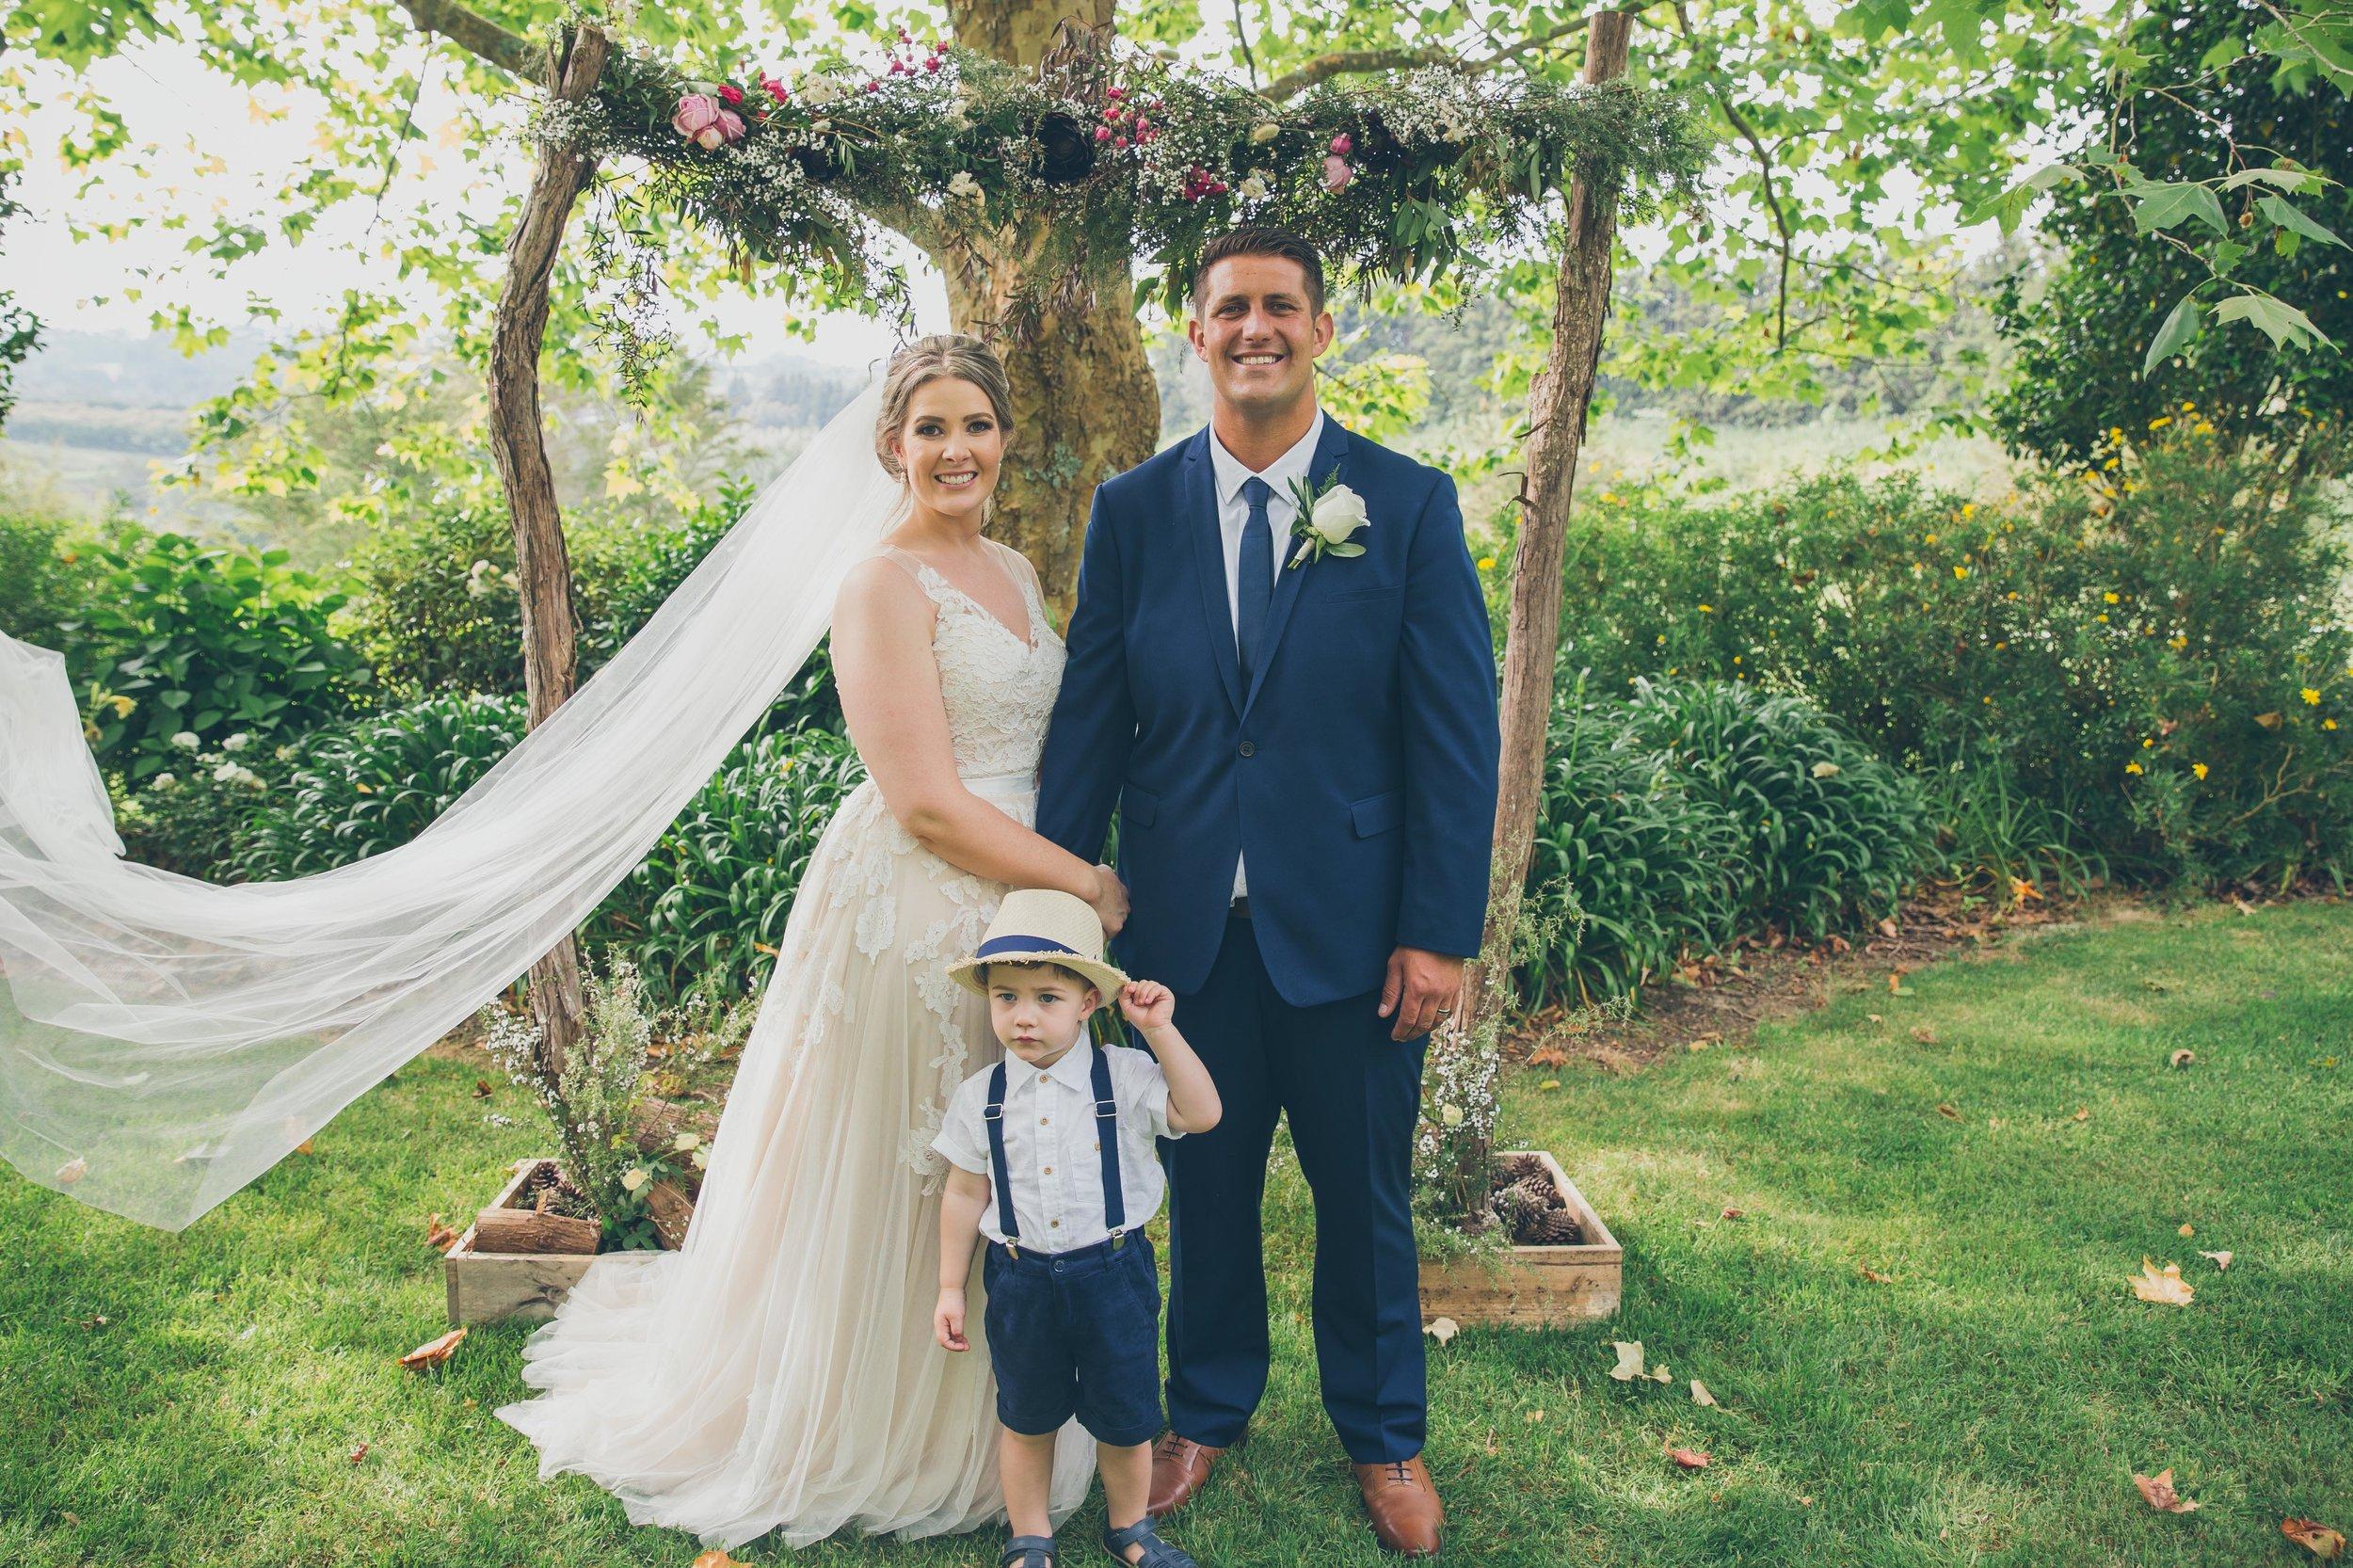 C & J - Wedding - Oh Joy! Photography - Tauranga, New Zealand-4.jpg